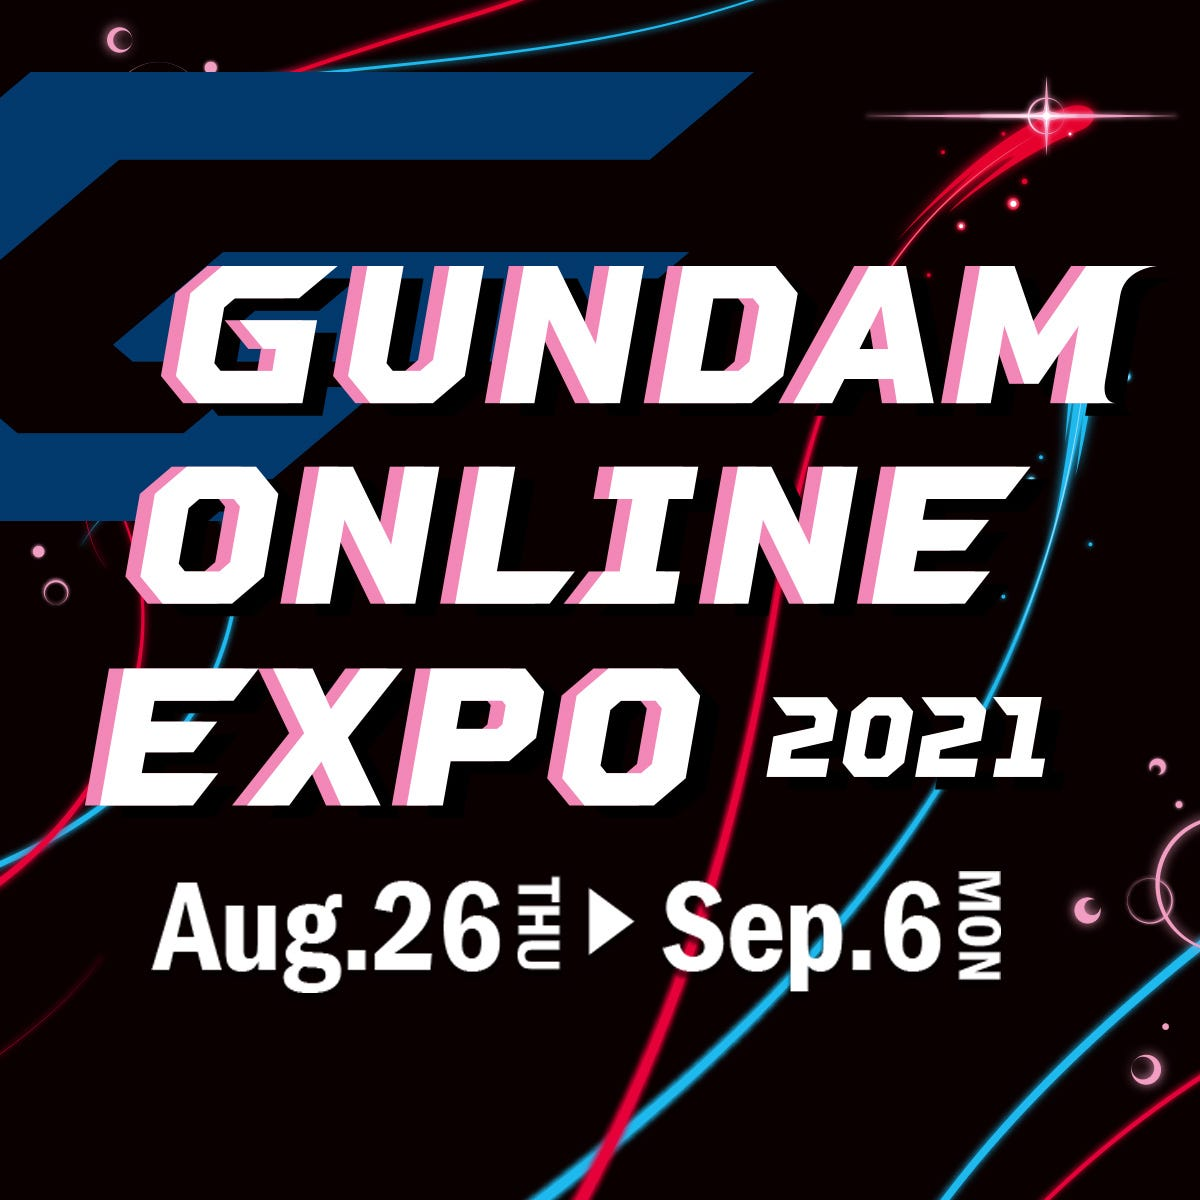 2021 Gundam Online Expo - AUG 26 - SEP 6